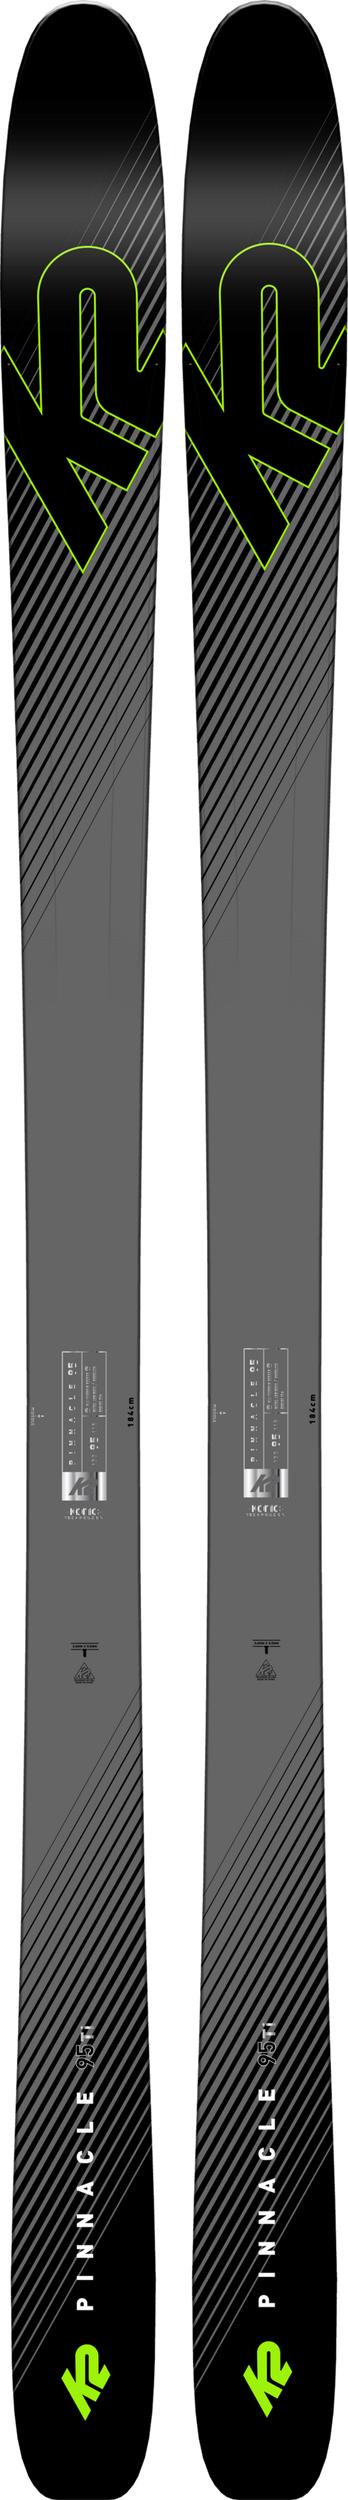 K2 Skis Pinnacle 95 TI  d47a606c90